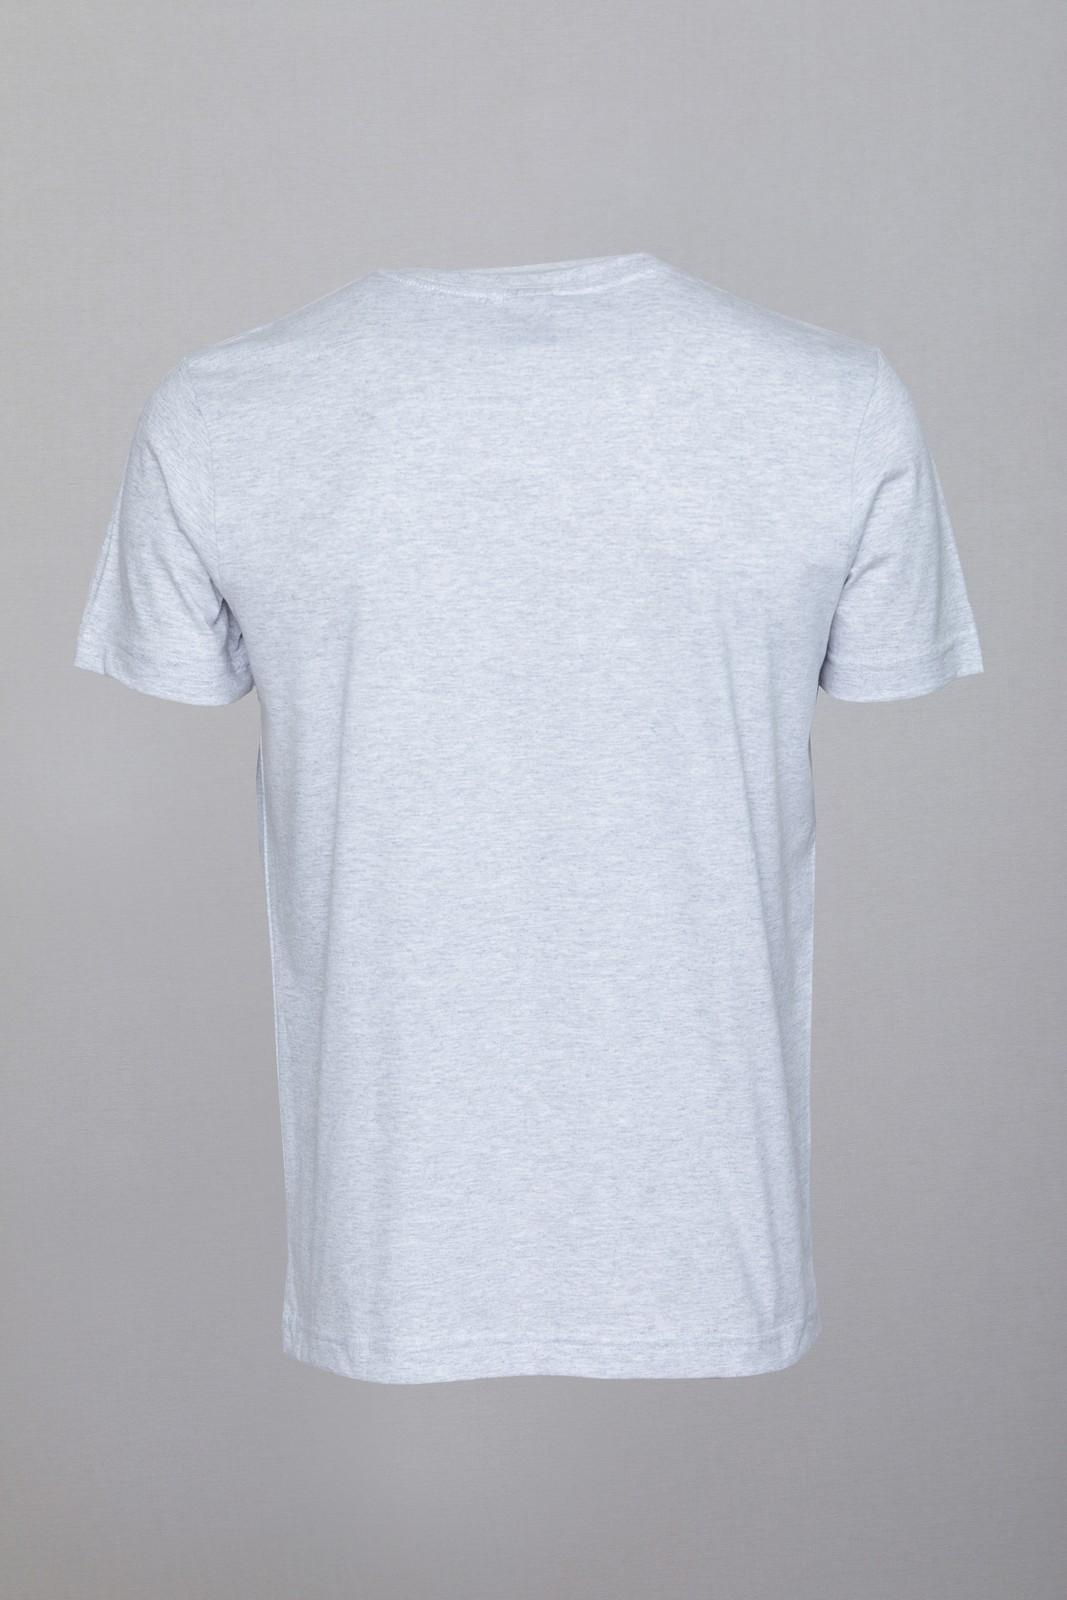 Camiseta CoolWave Básica Mescla Cinza